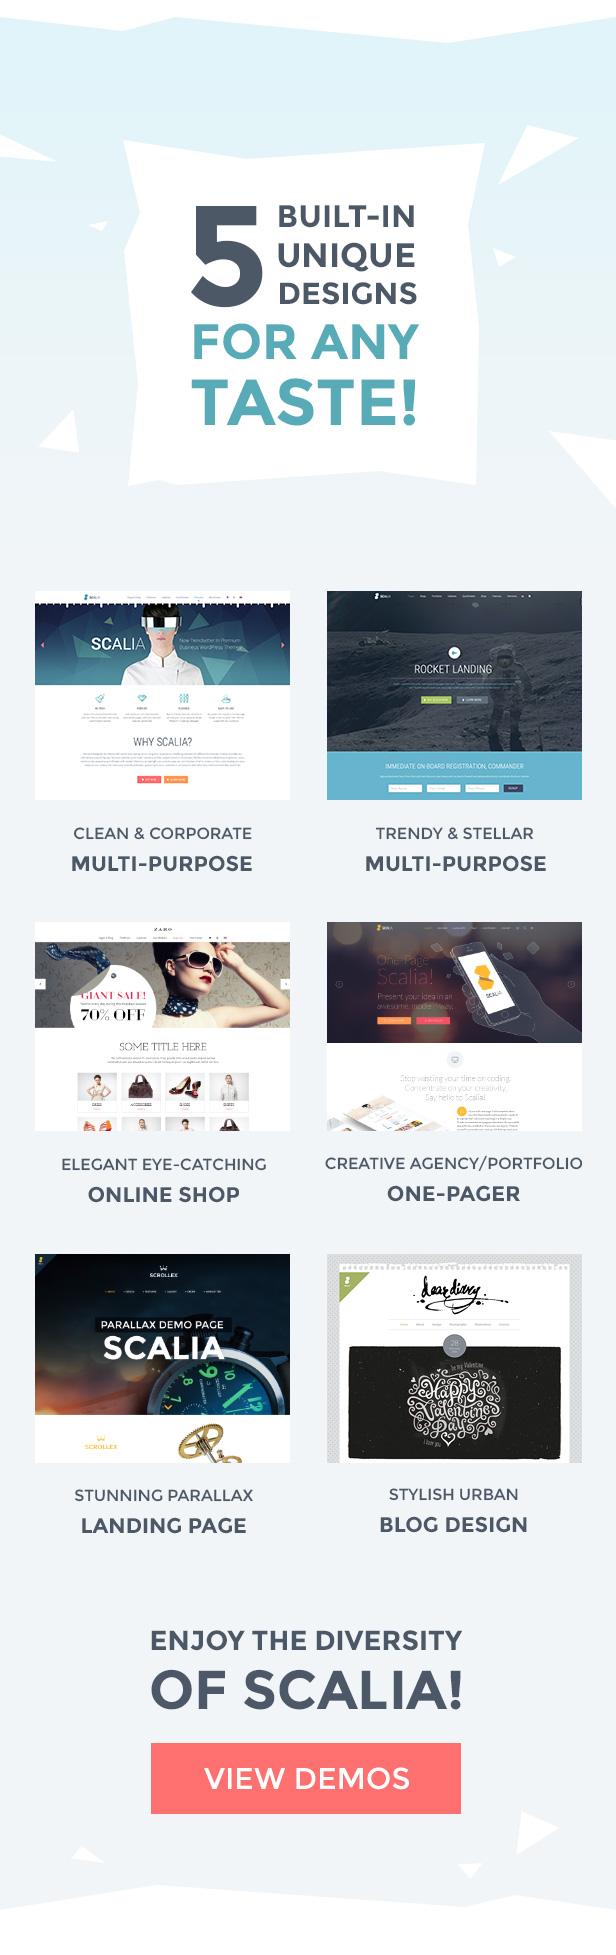 Scalia - Multi-Concept Business, Shop, One-Page, Blog Theme - 1